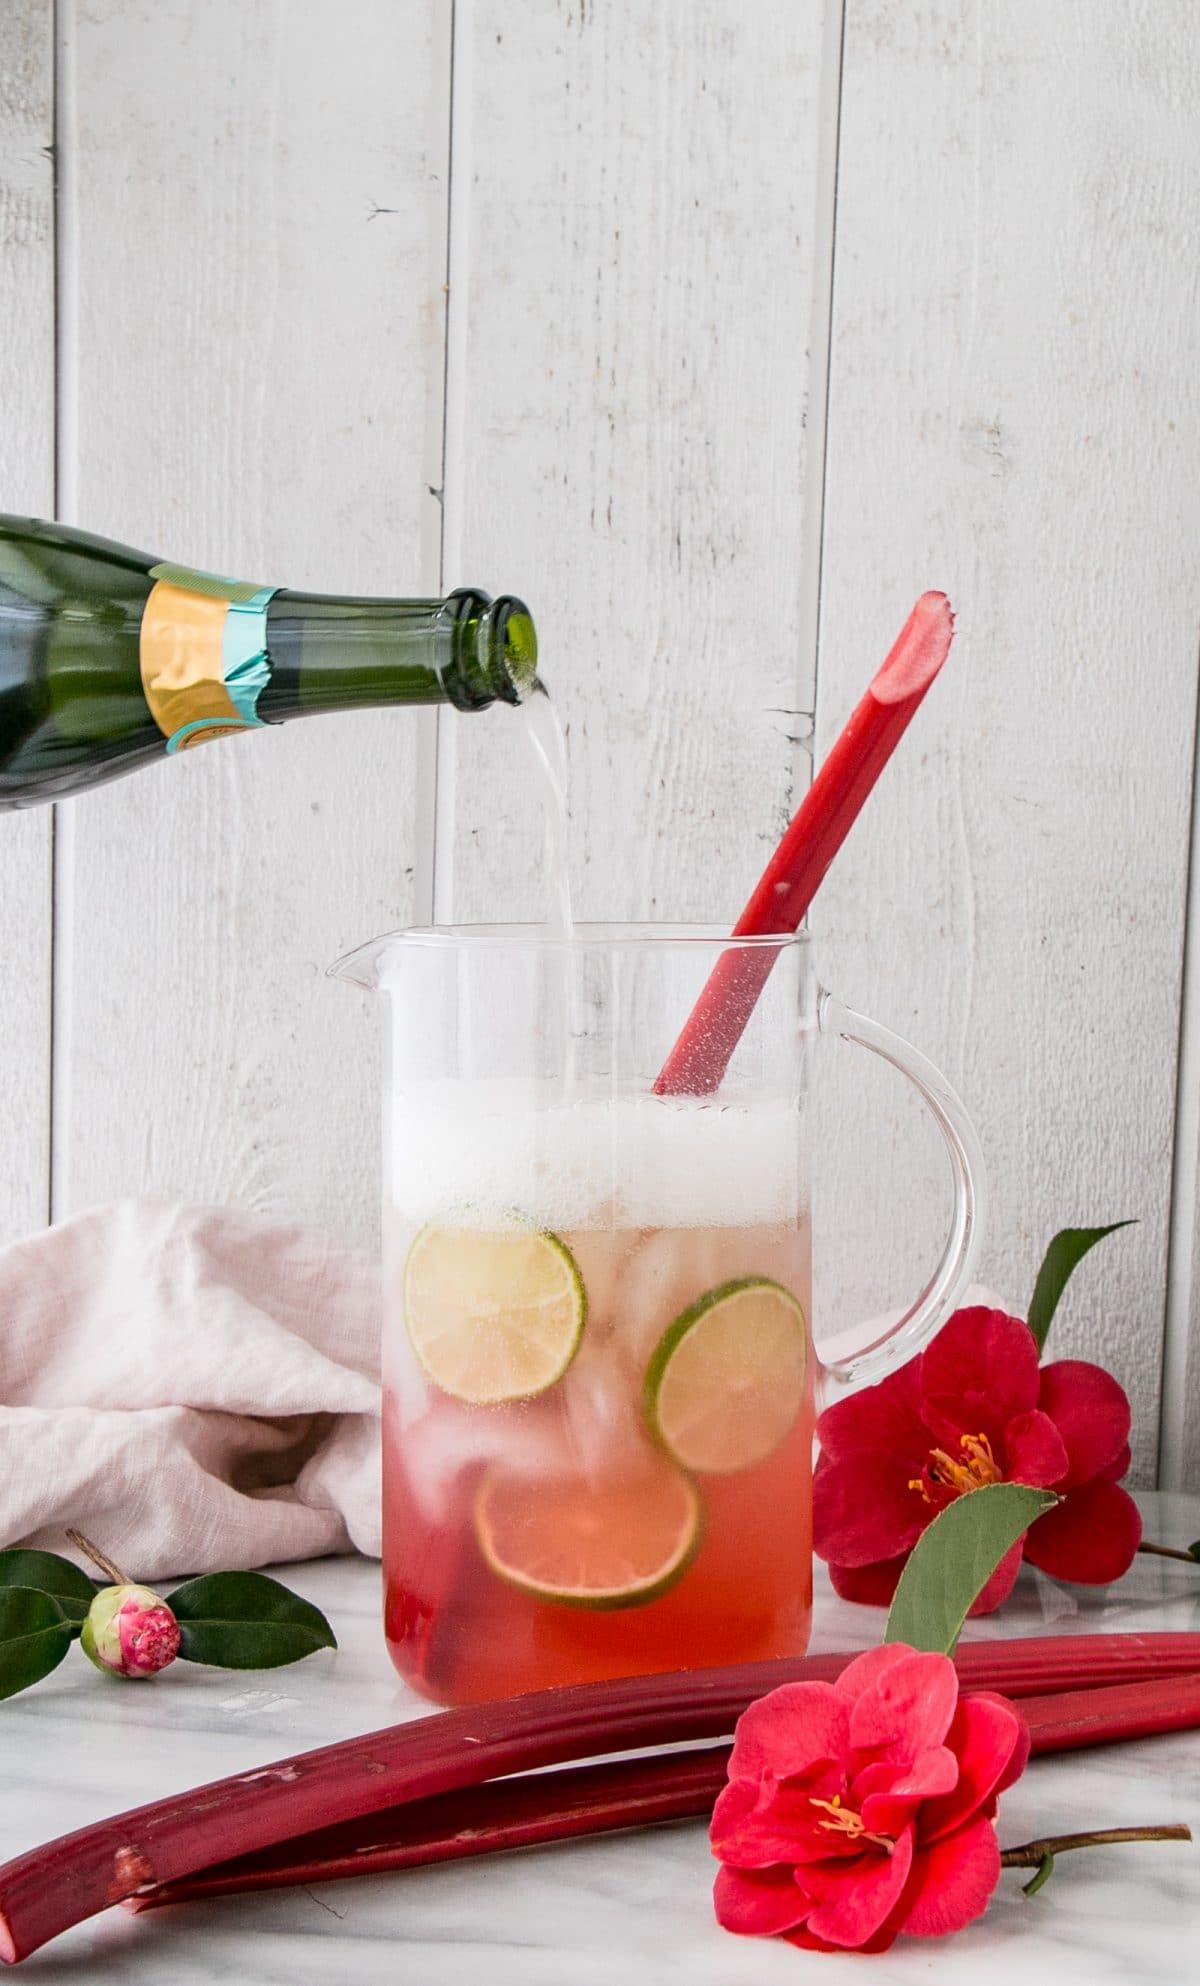 Sparkling Rhubarb Margarita Recipe